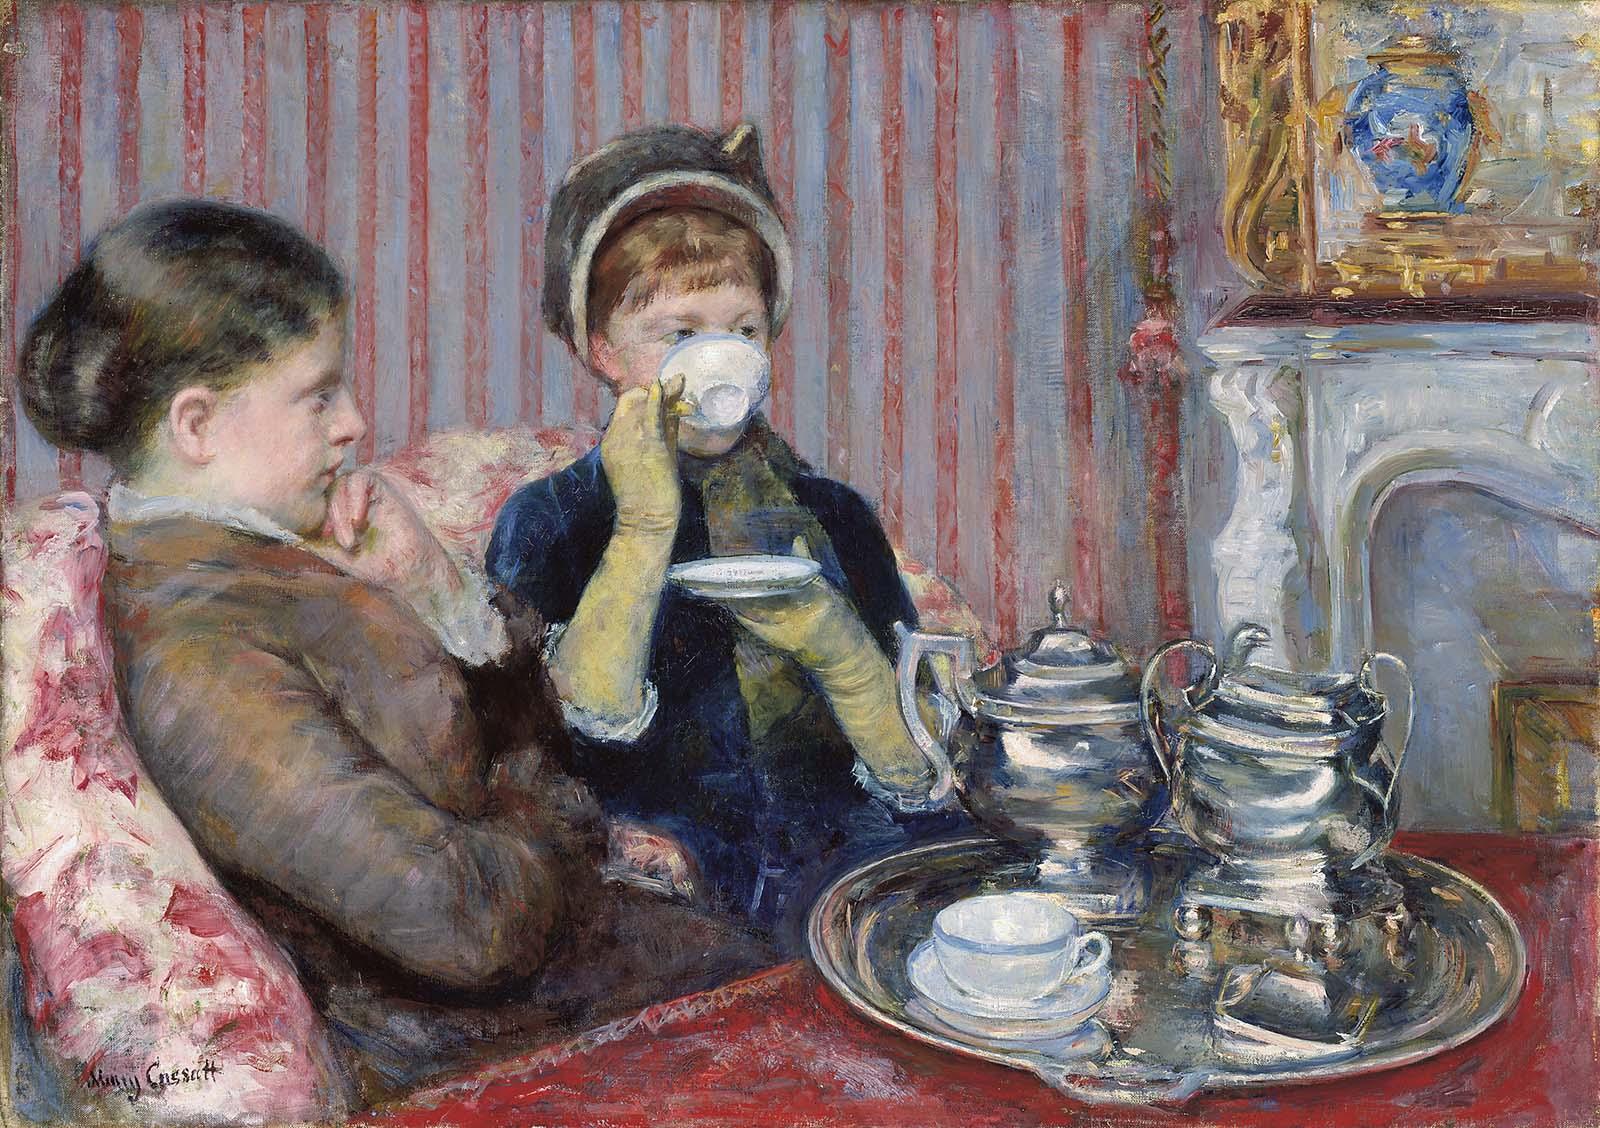 The Tea | Museum of Fine Arts, Boston